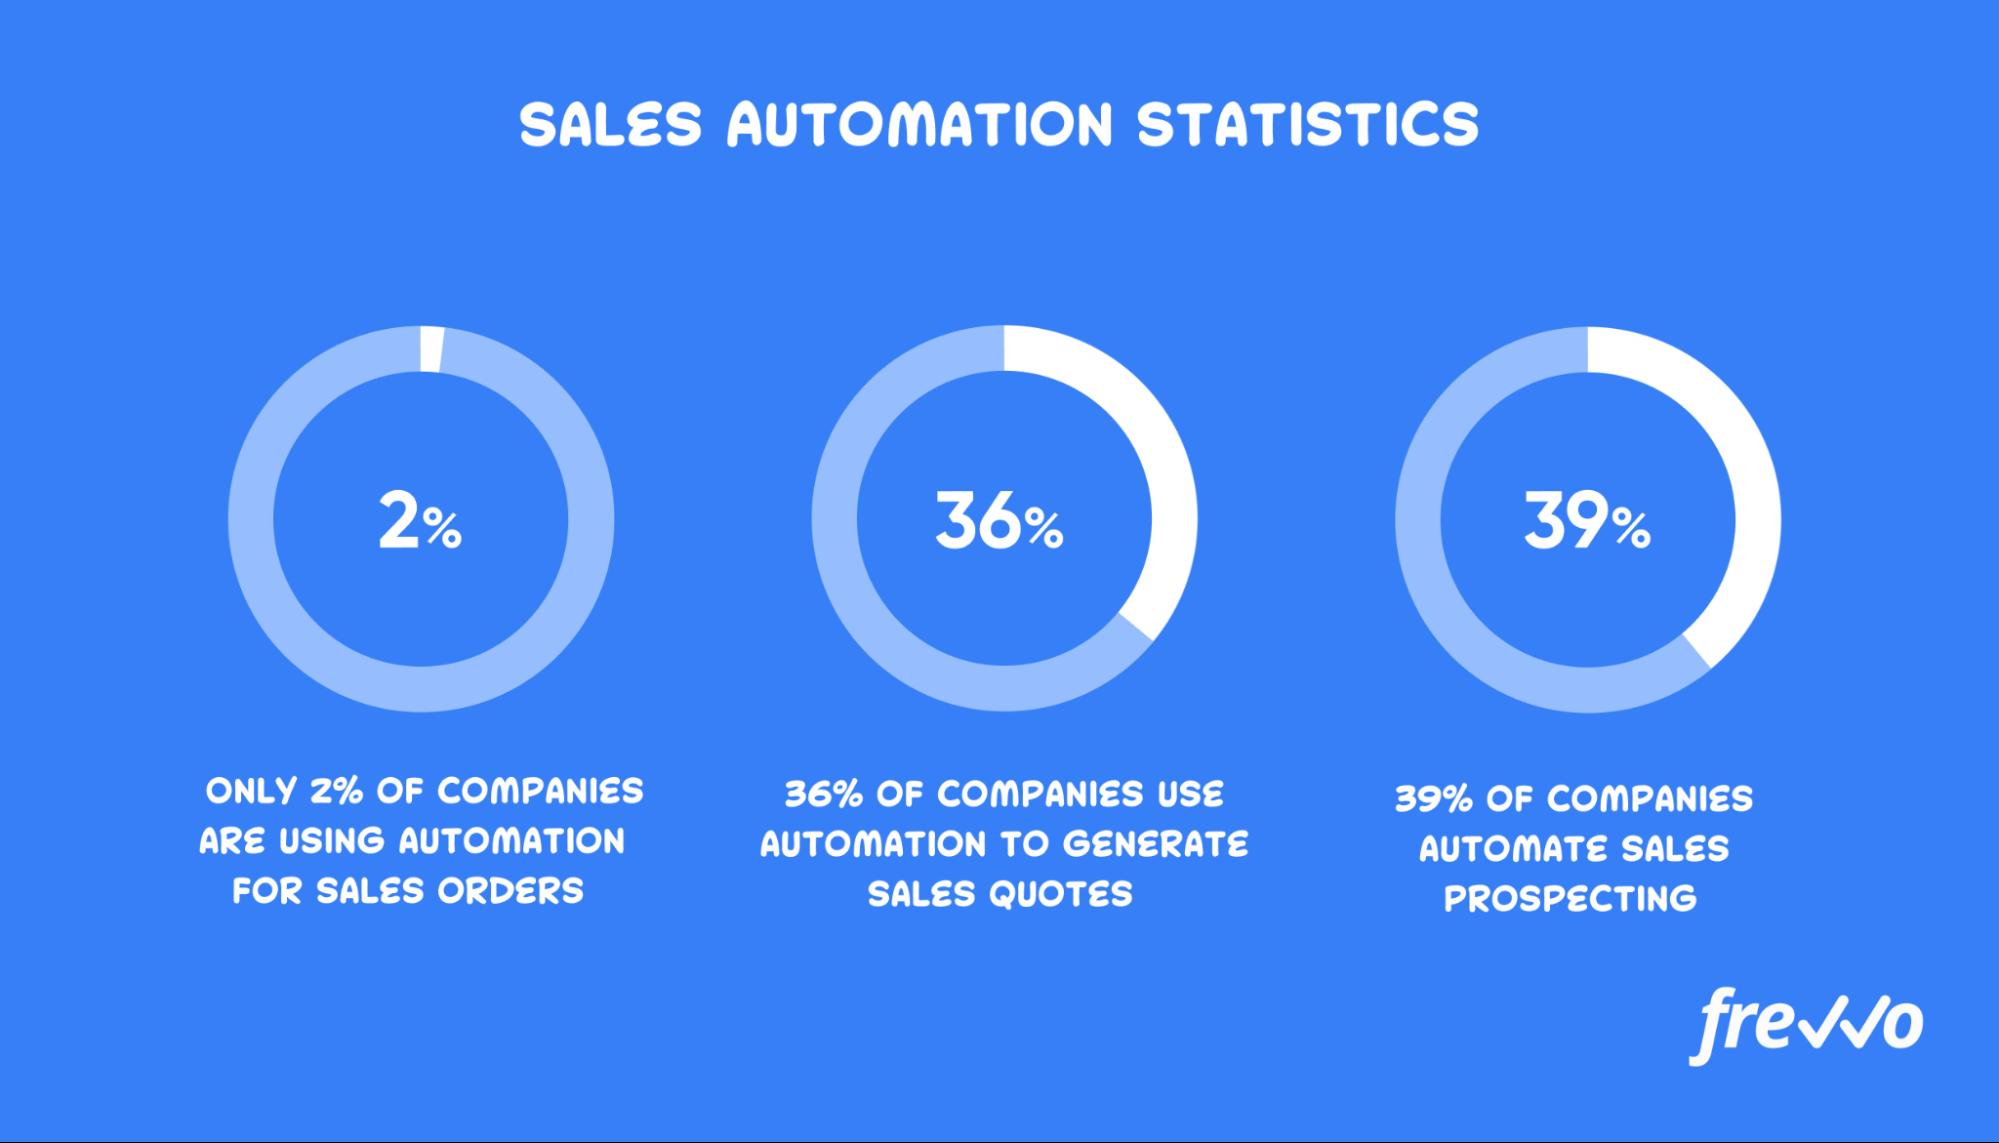 Sales automation statistics